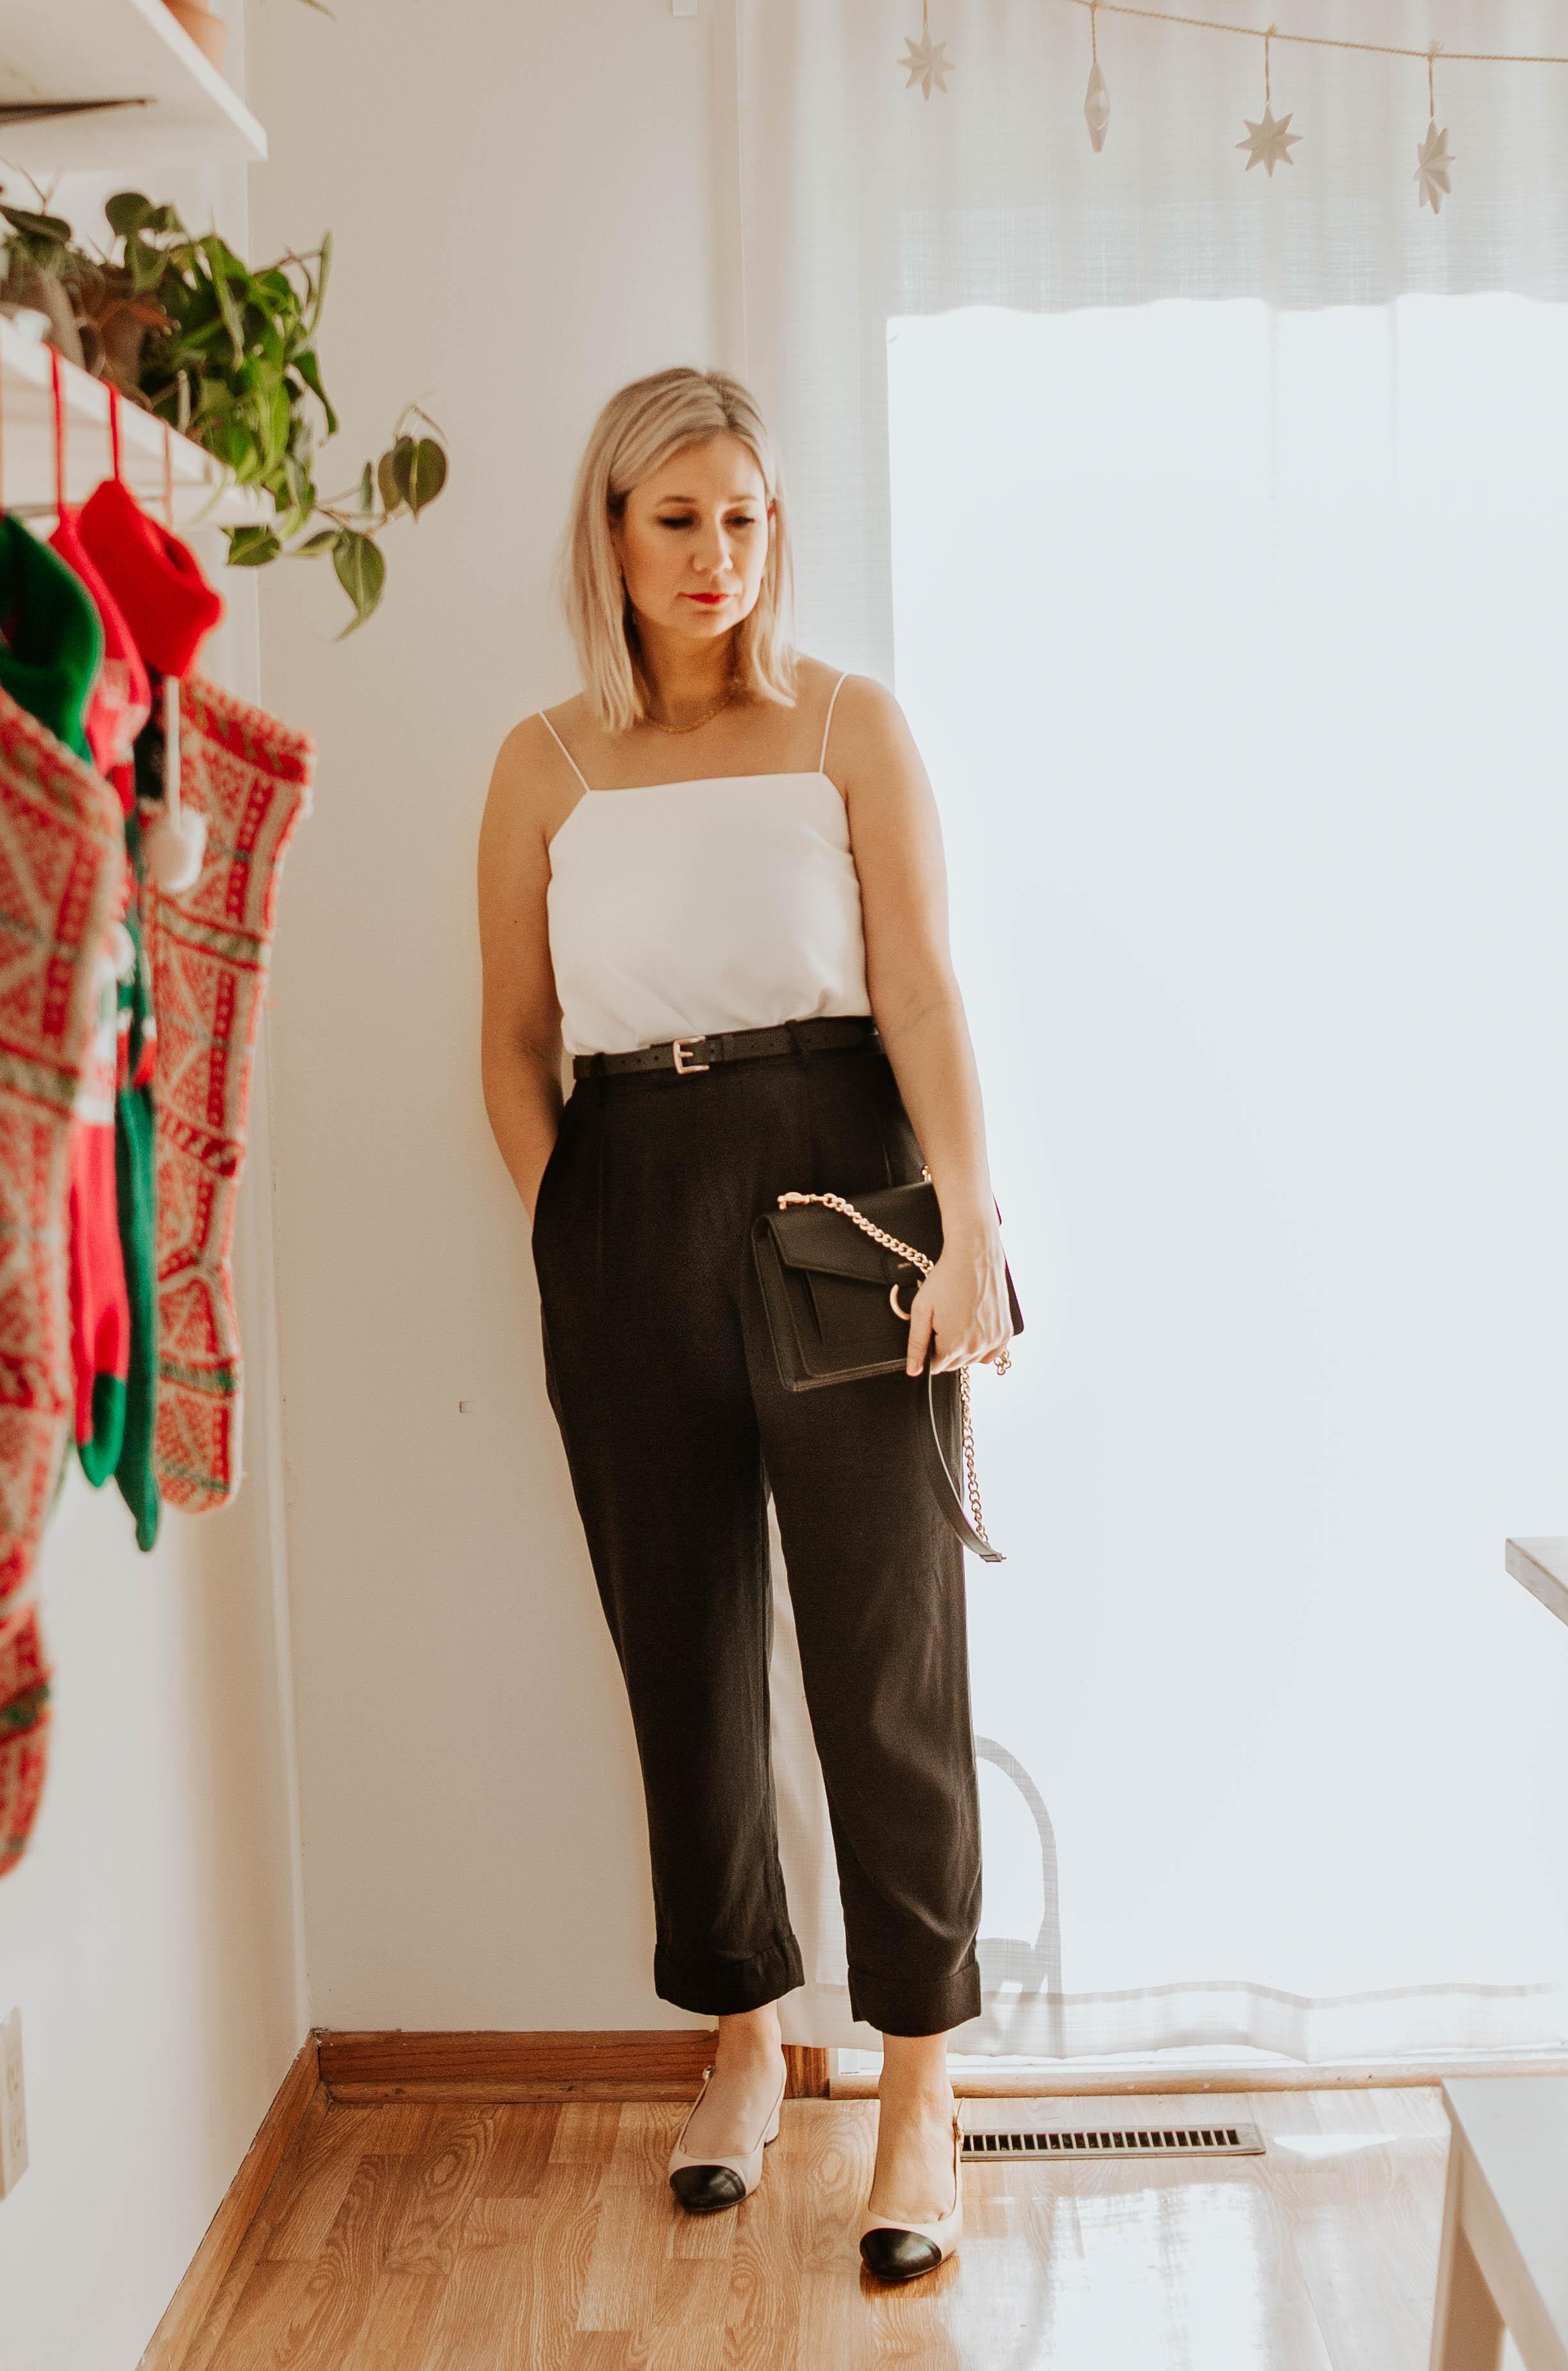 Mini Holiday Lookbook Featuring Ethical Fashion, white cami, black trousers, everlane pleat pants, everlane goweave black chain bag, cap toe slingbacks, chanel slingbacks